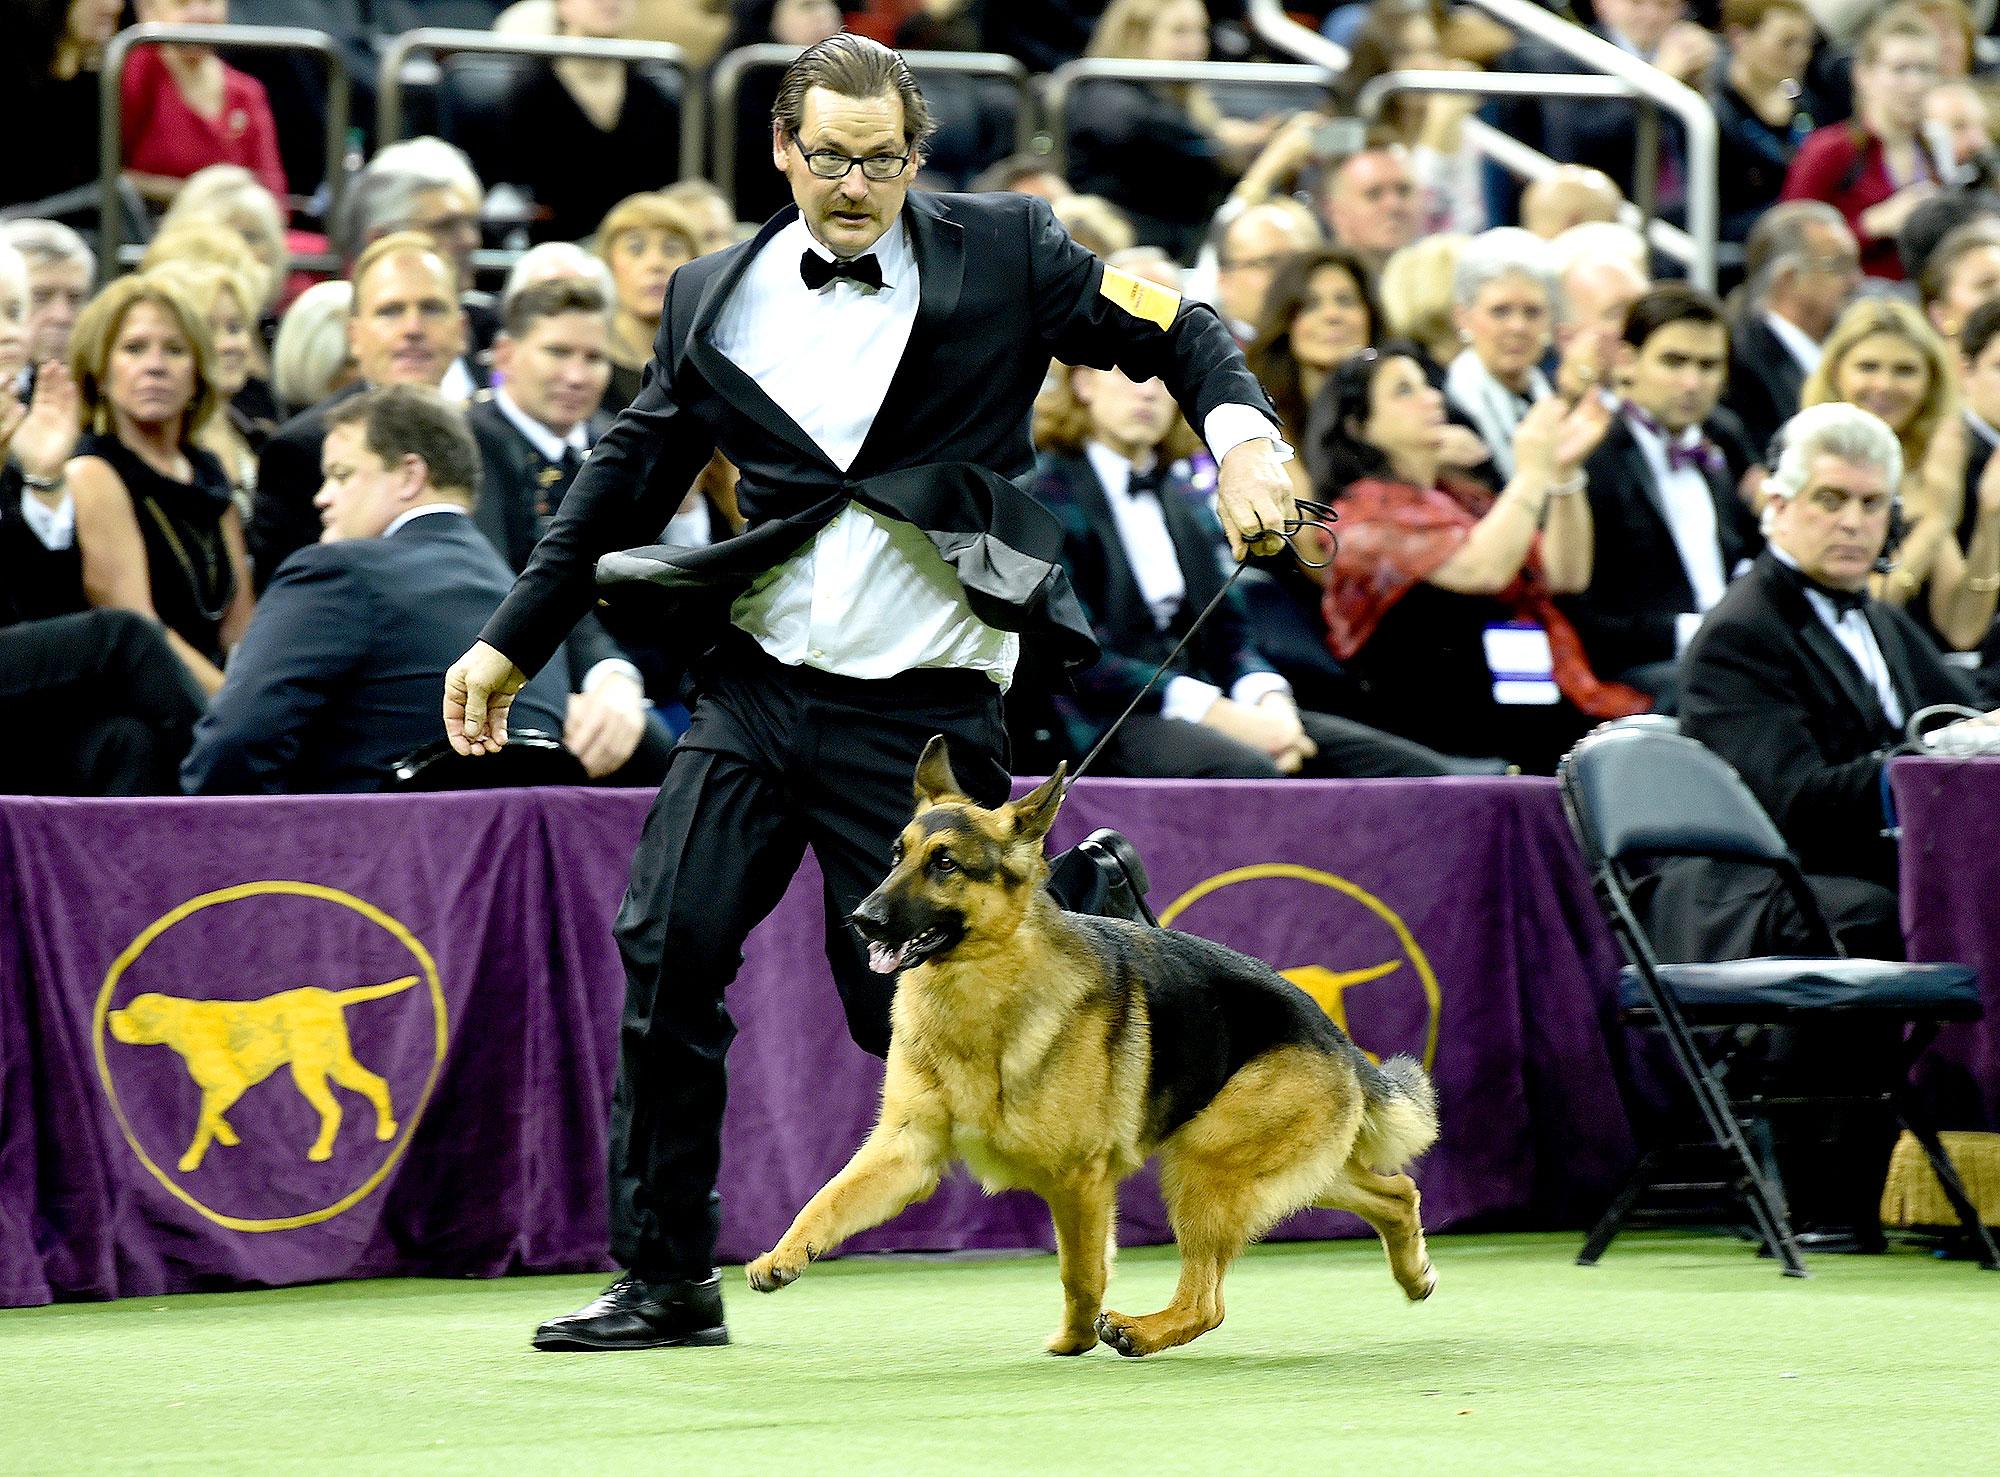 Rumor, a German shepherd, and Kent Boyles his handler run around the ring during judging before winning